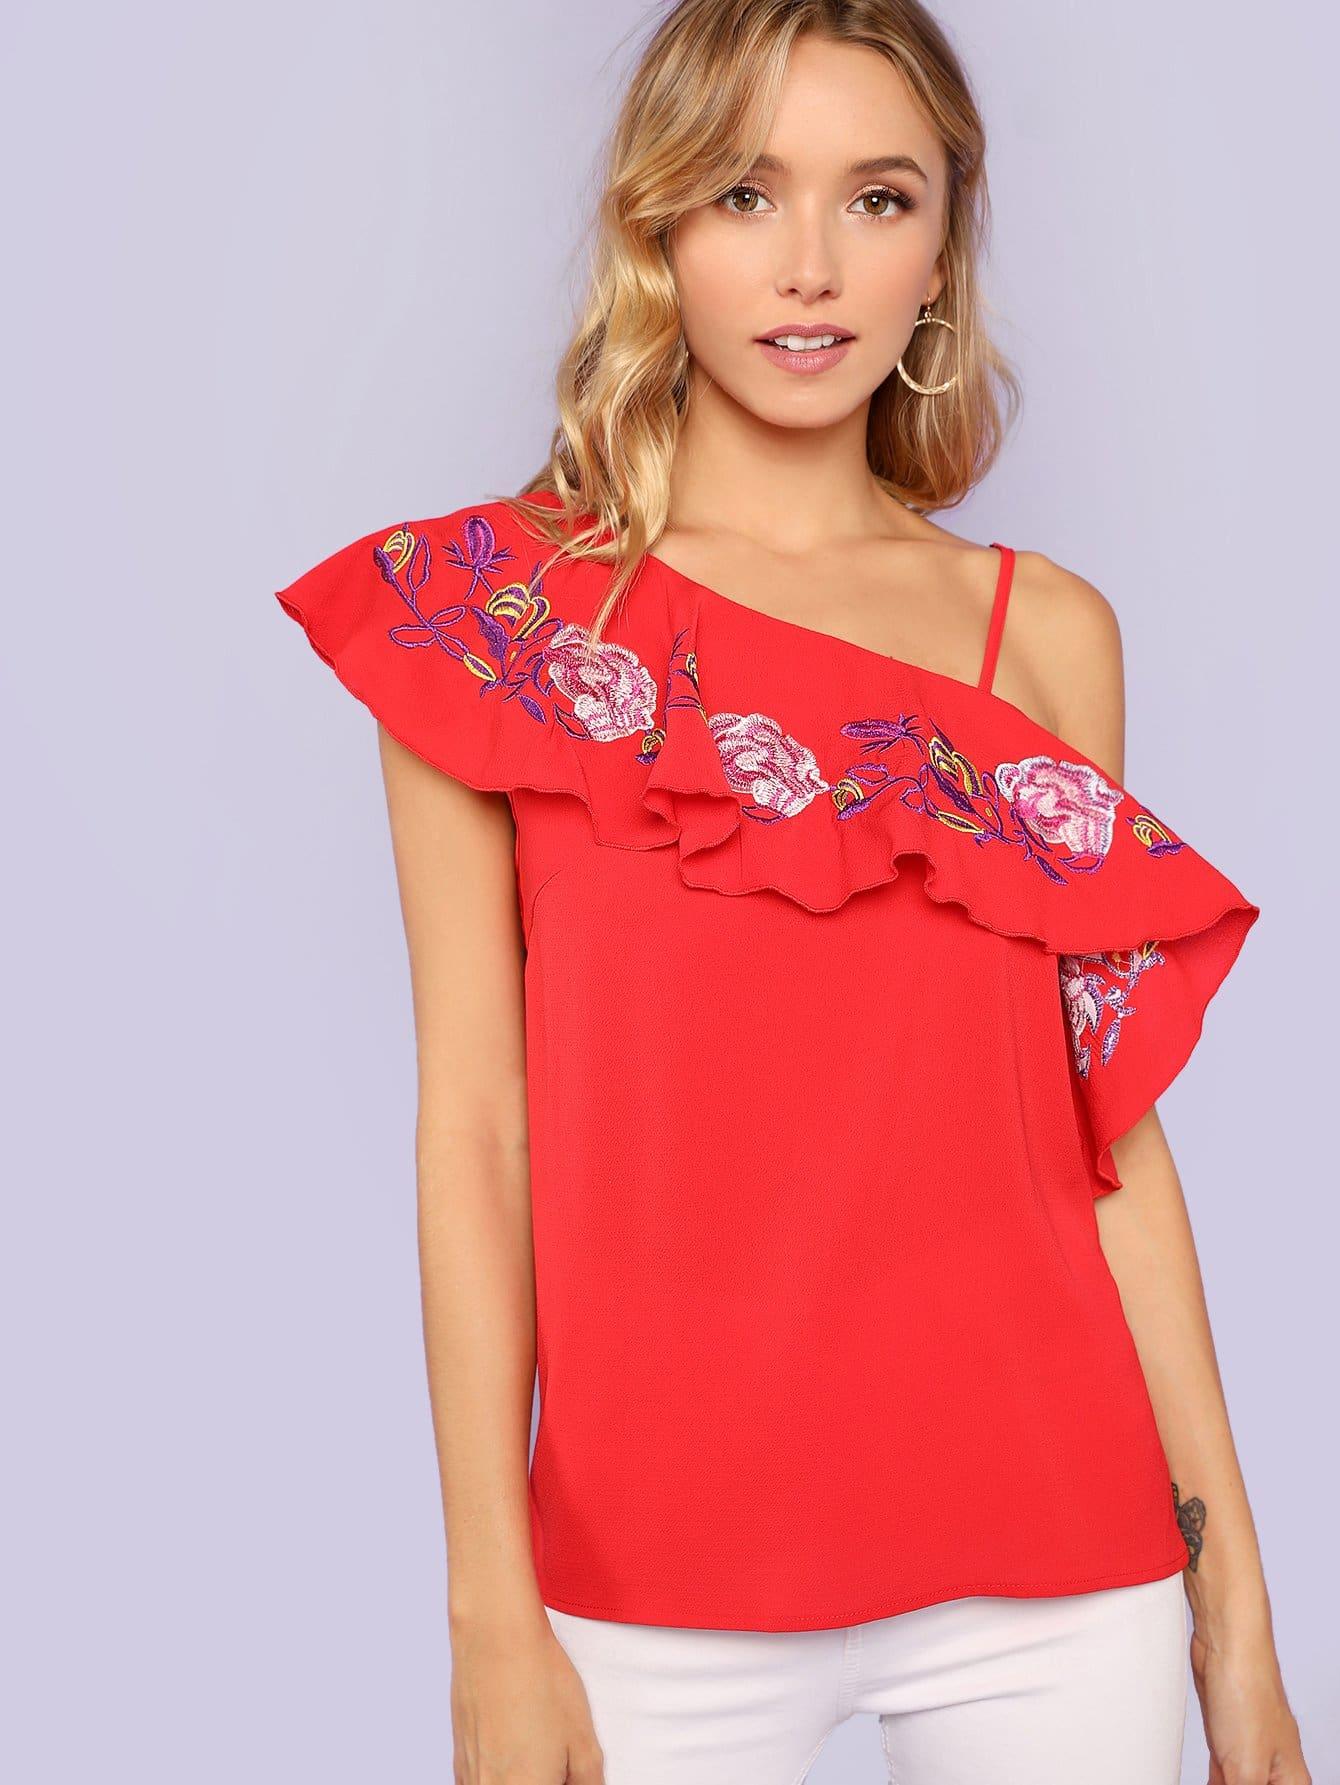 Embellished One Shoulder Ruffle Top one shoulder ruffle embellished dress